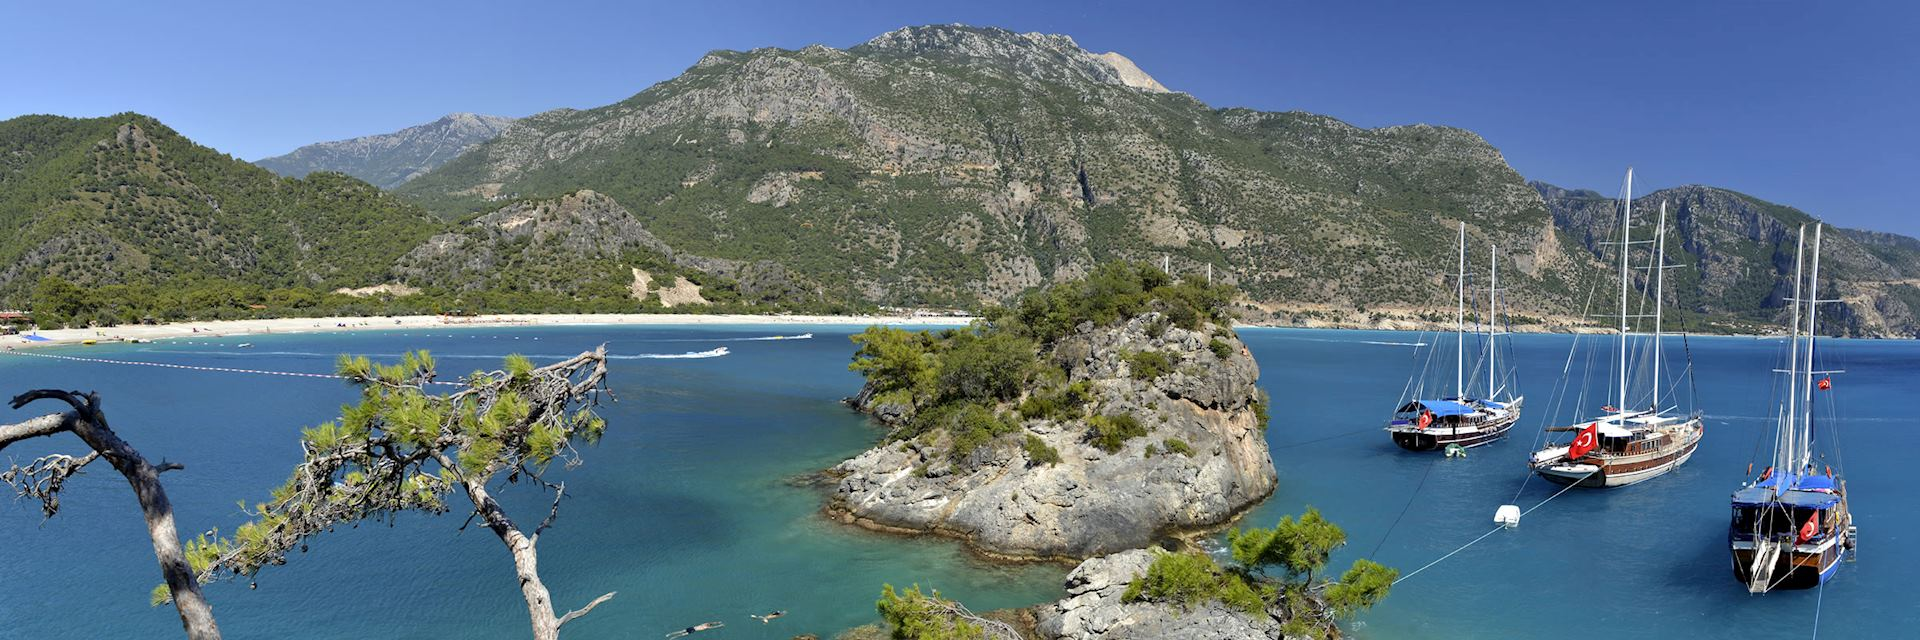 Coastline in Fethiye